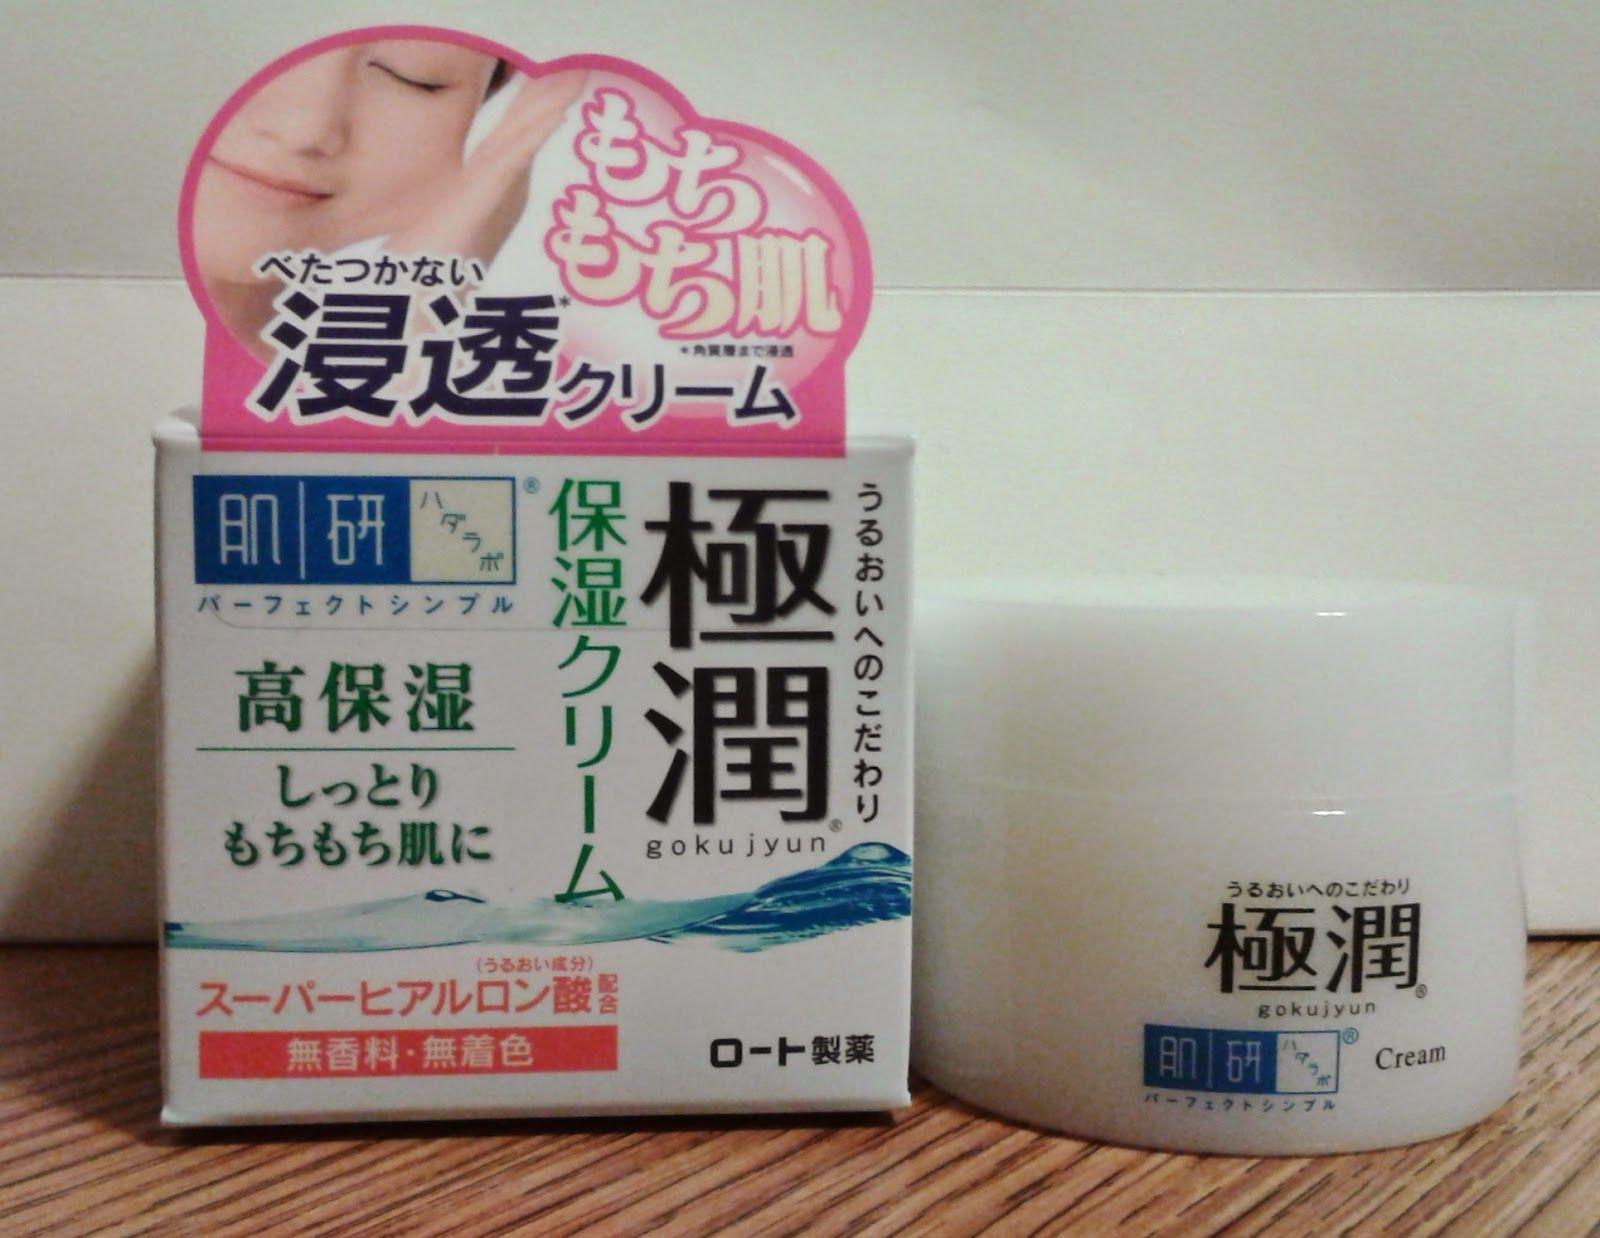 Living Beautifully X3 Review On The Hado Labo Gokujyun Facial Cream And The Aquamoist Facial Cream Facial Cream Facial Winter Skin Care